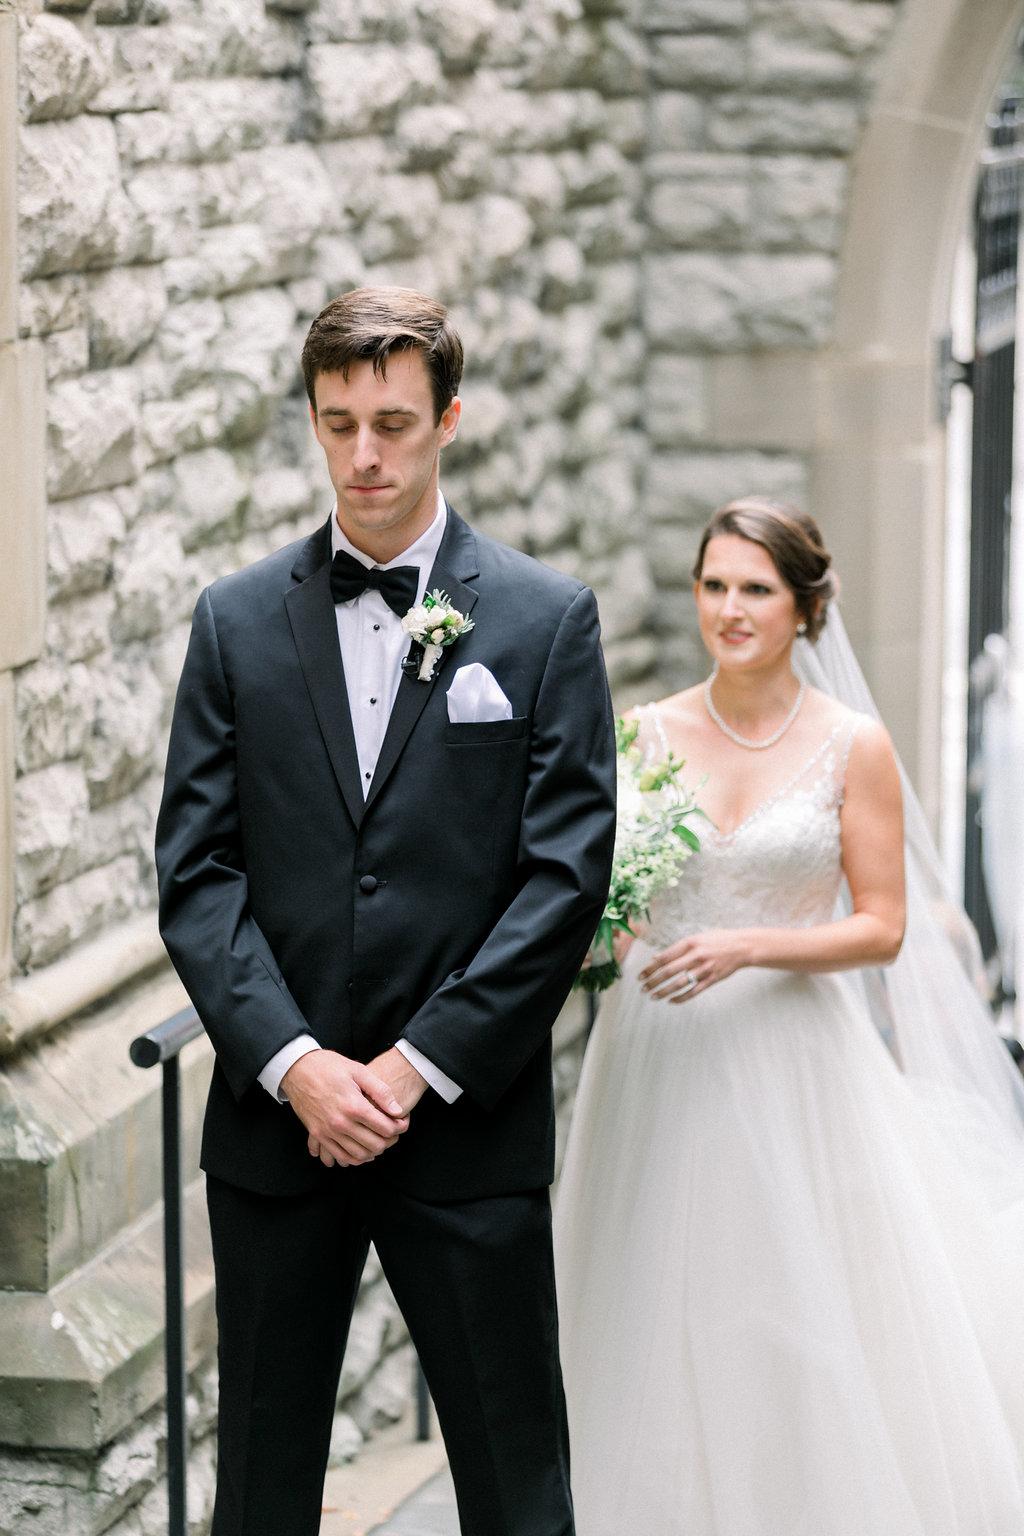 Ault Park Wedding - First Look